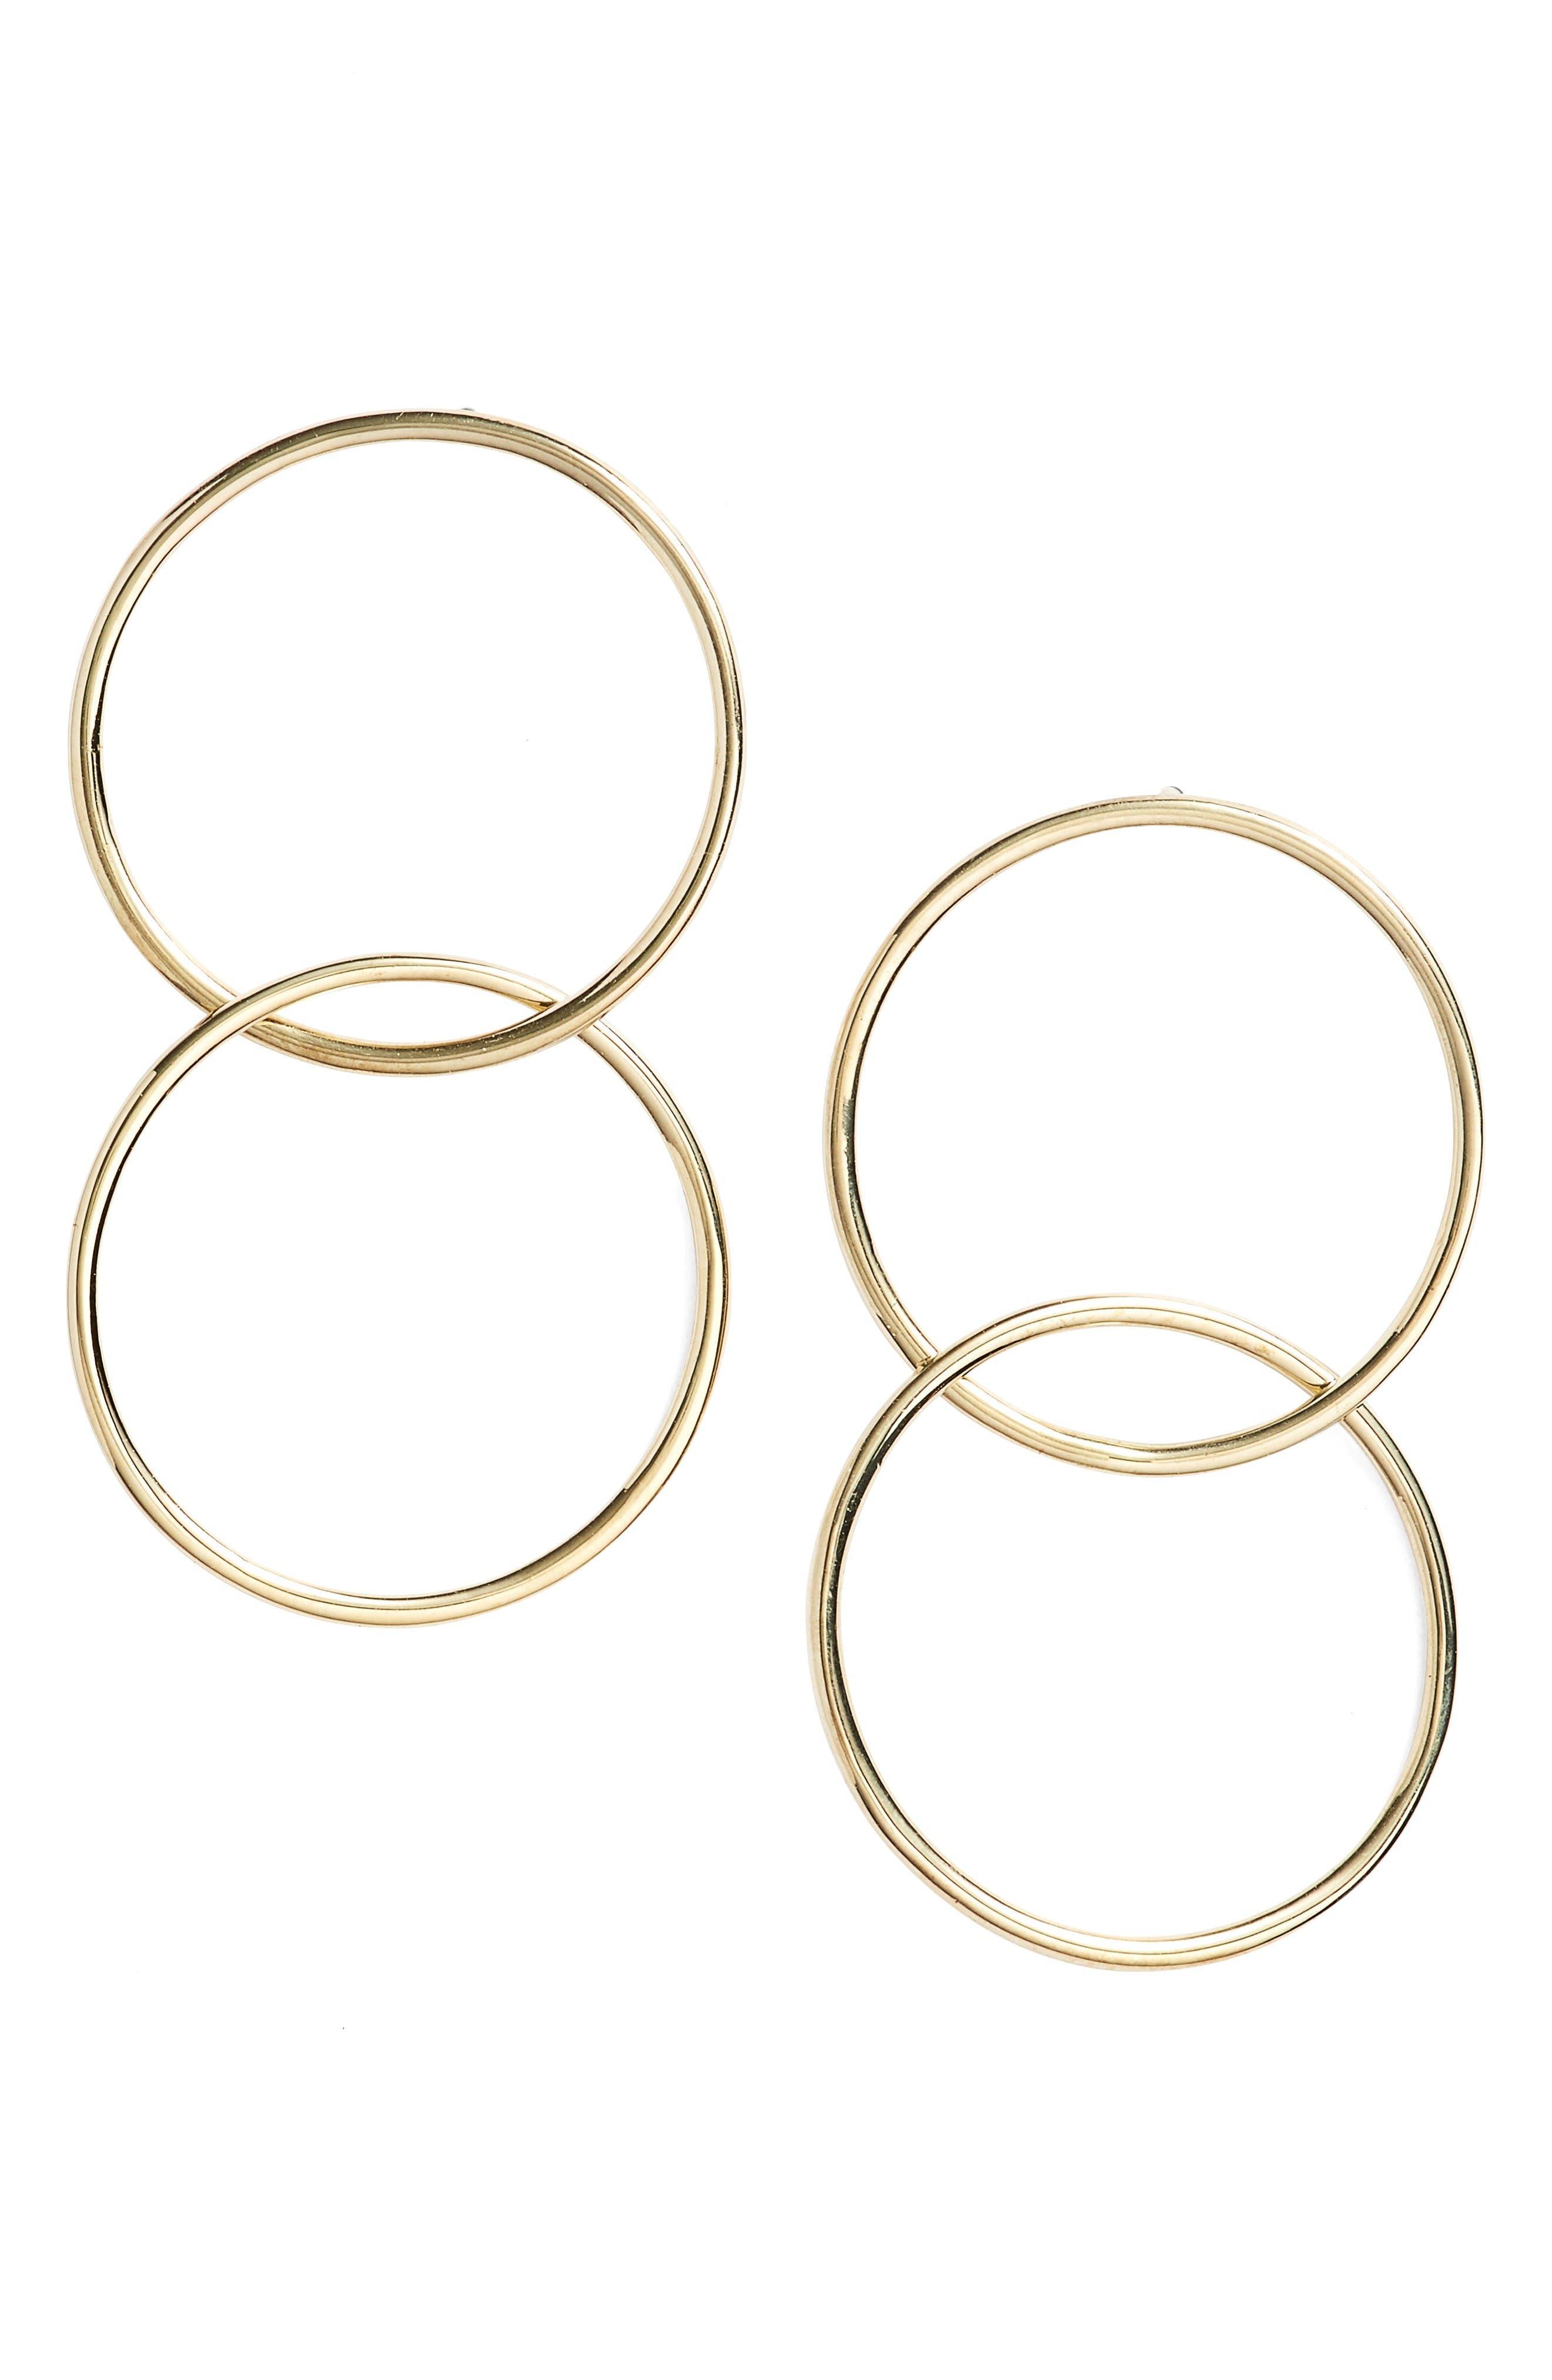 Alternate Image 1 Selected - Bony Levy Geo Linked Circle Earrings (Nordstrom Exclusive)